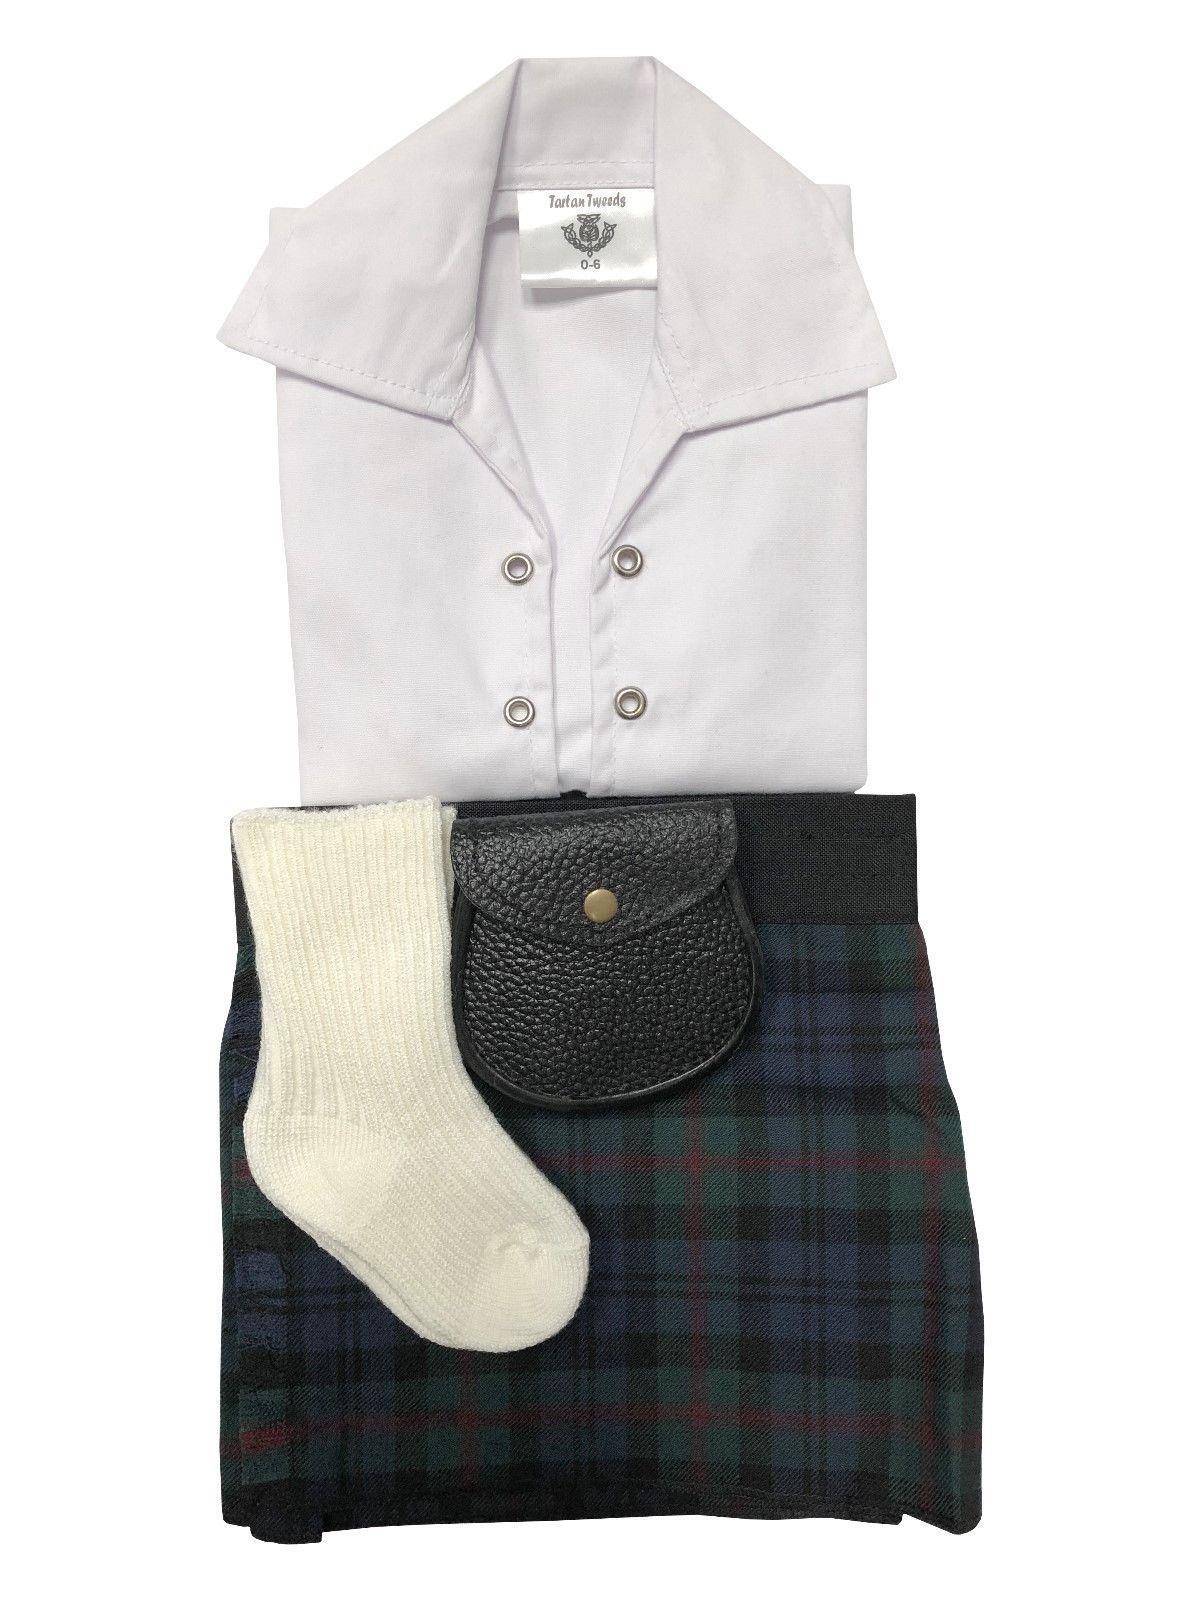 5 Years Royal Stewart Tartan Baby  Kilt Outfit 6 Months